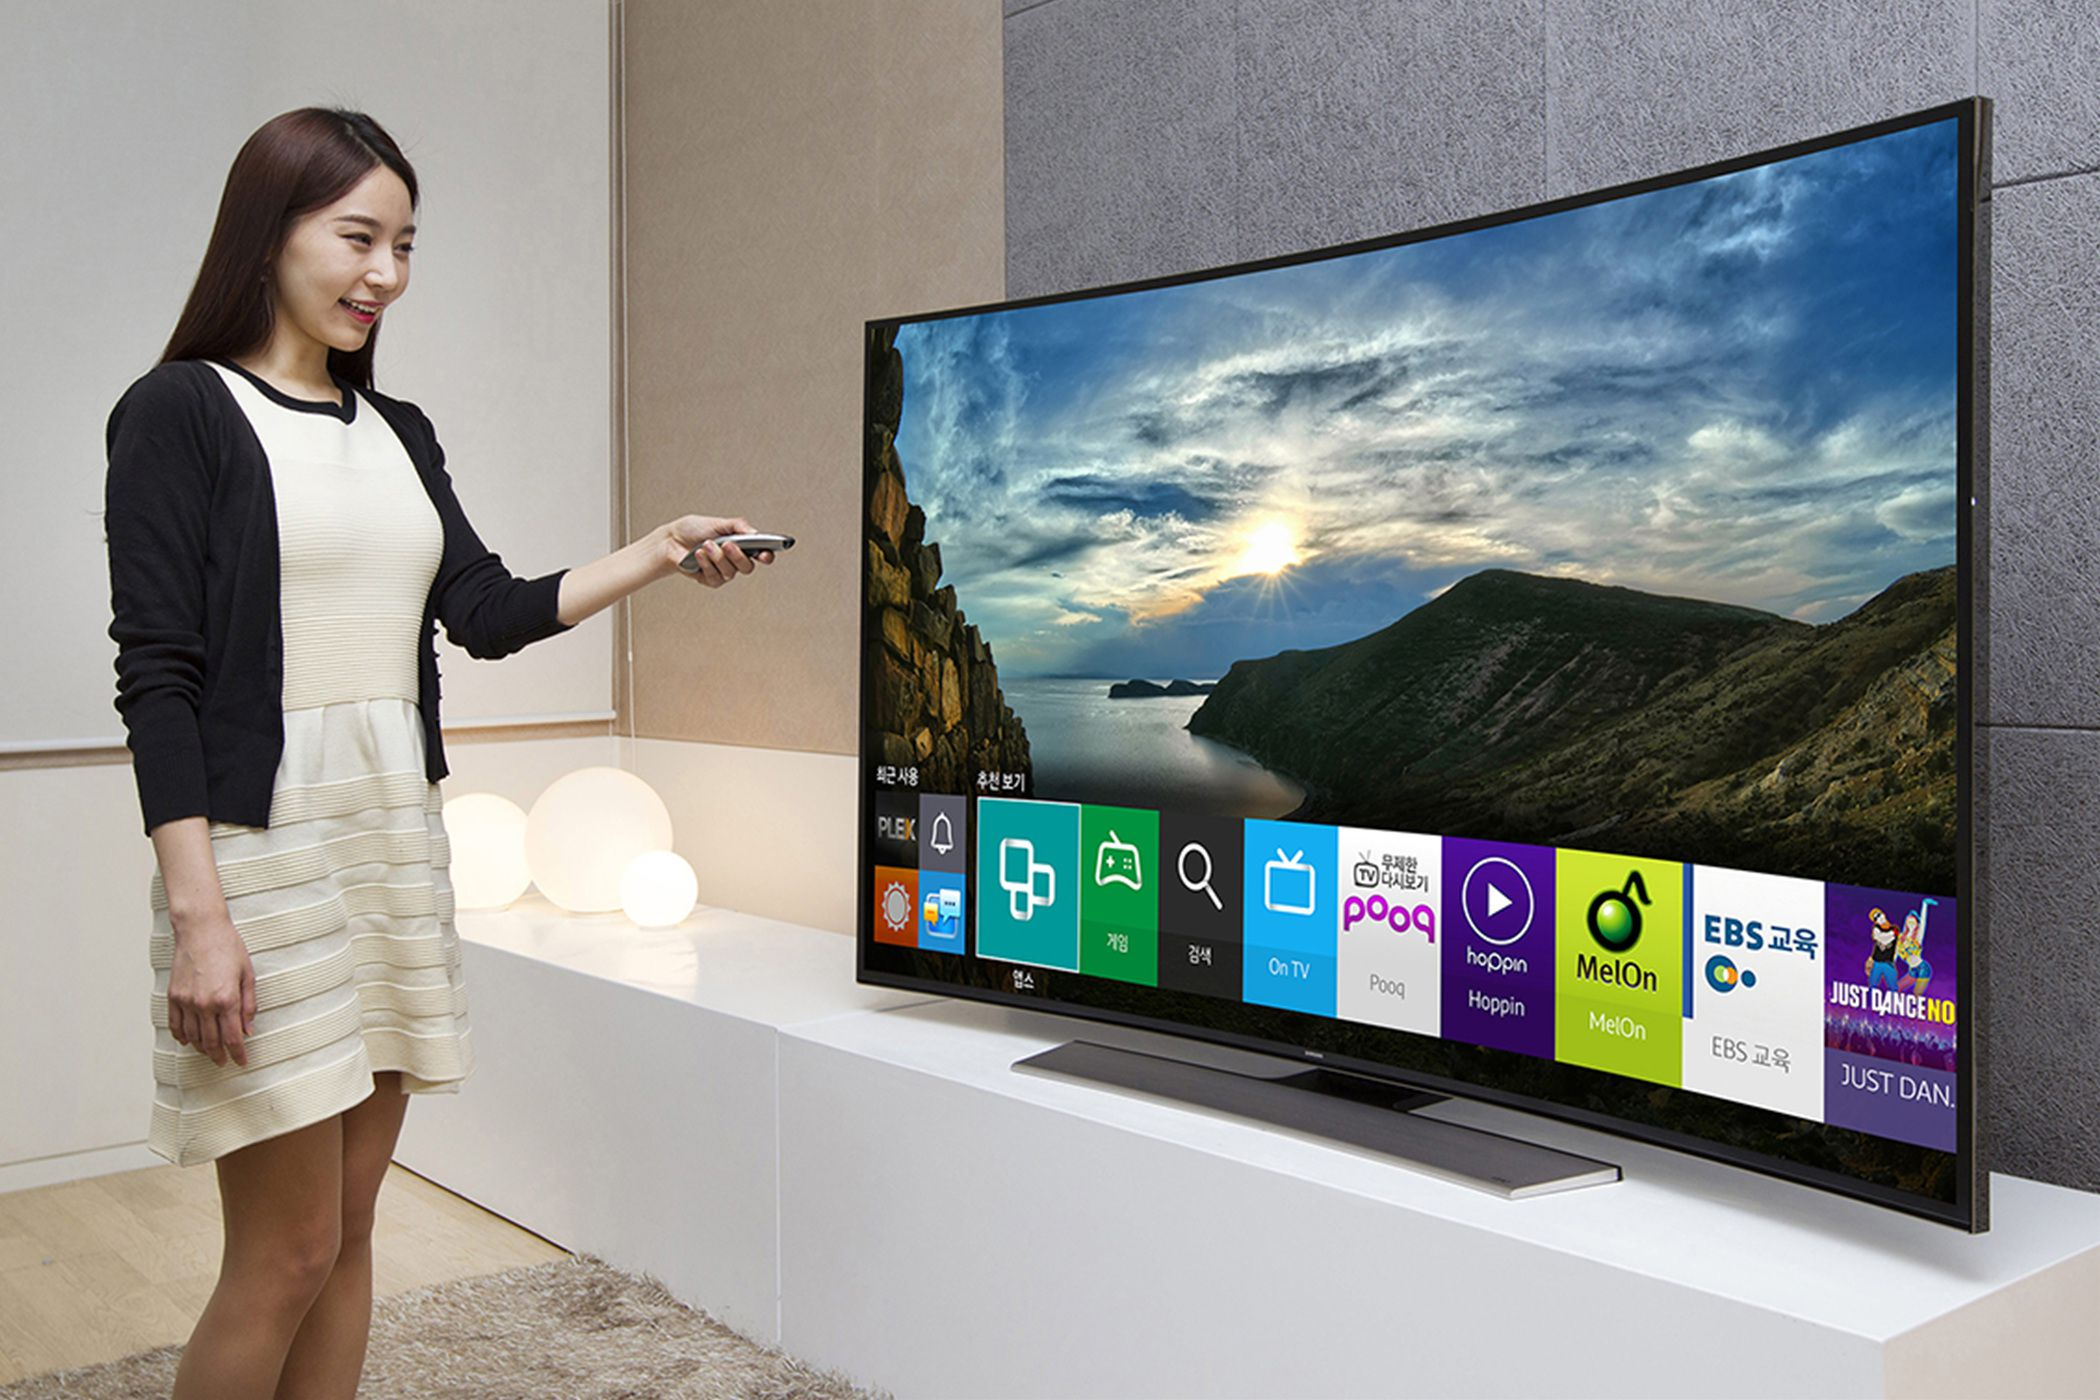 Apple Samsung 2019 Smart TVs support iTunes Apple AirPlay